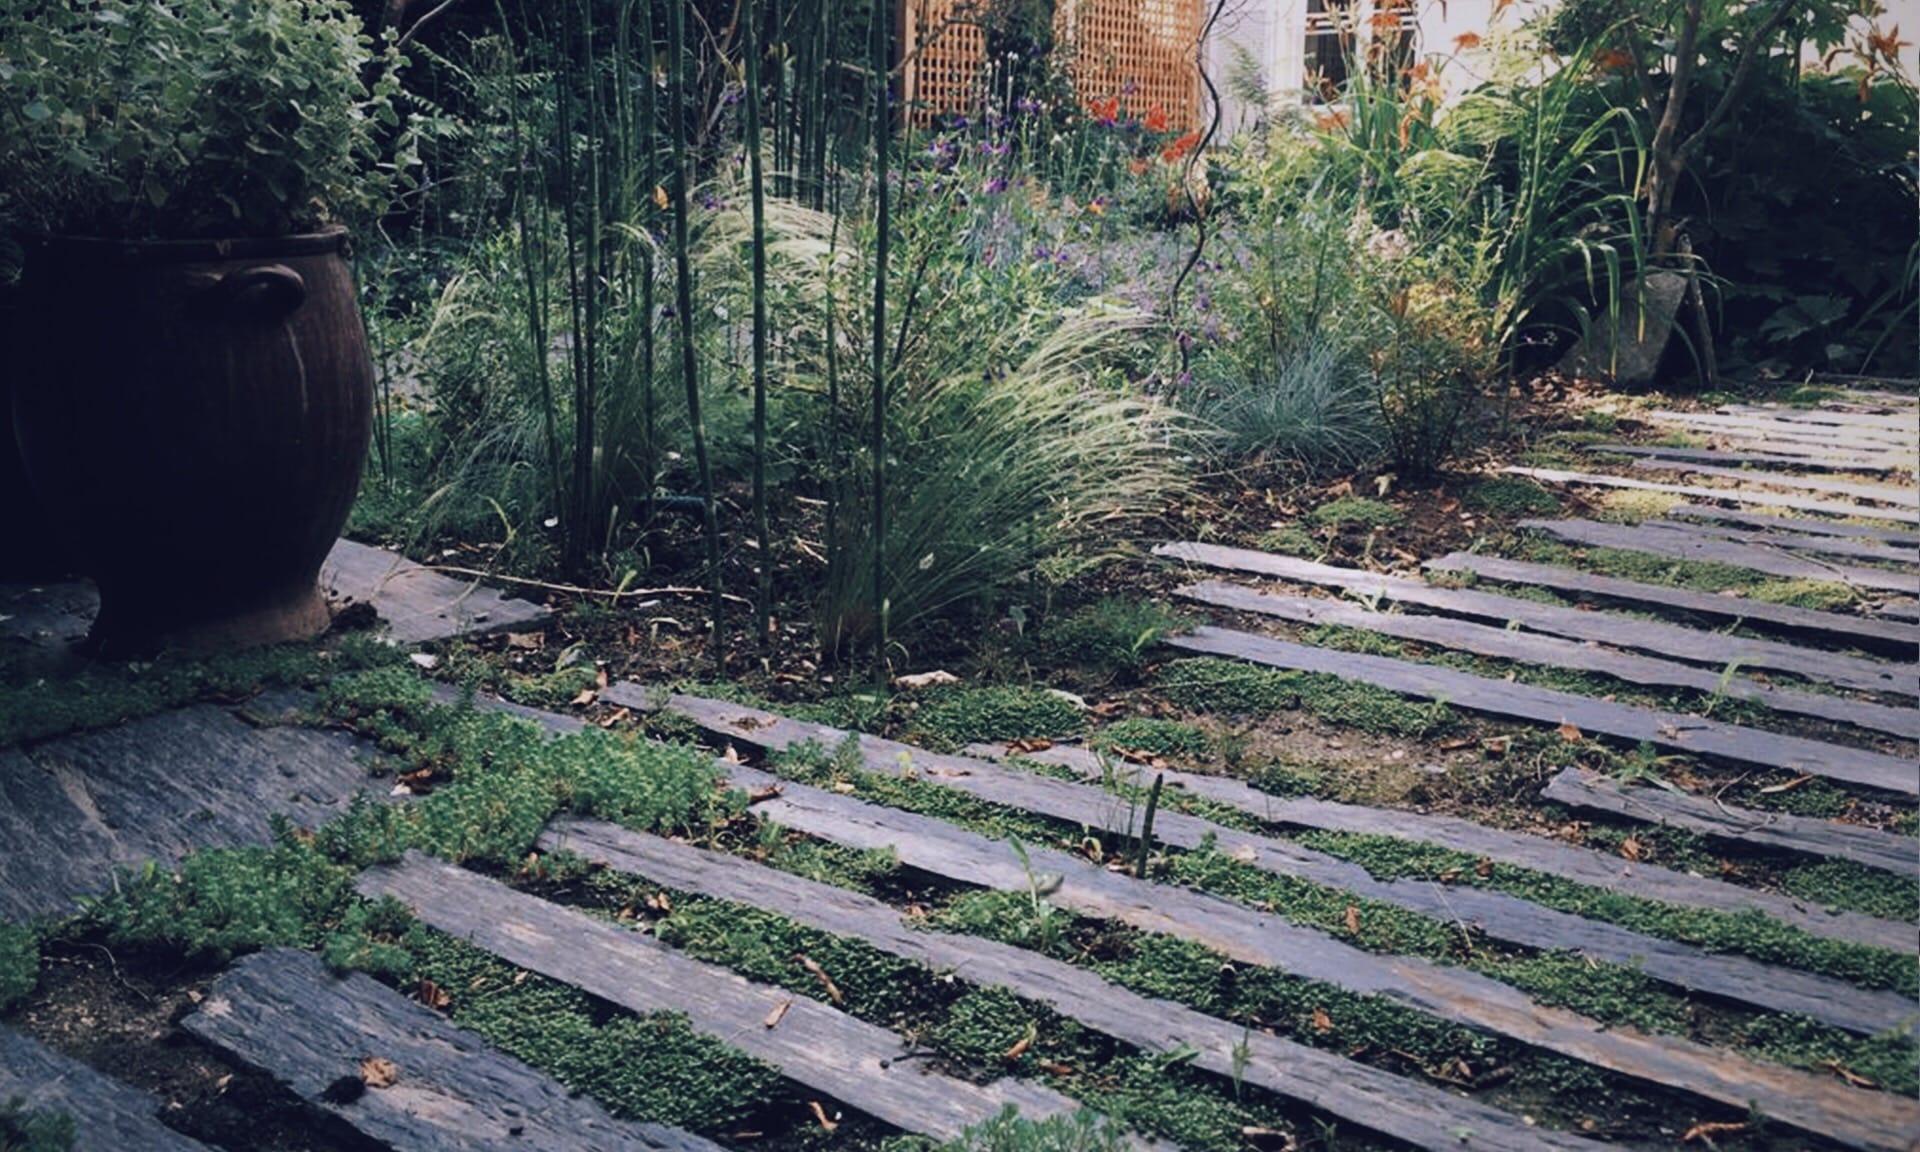 03_Nordscape_chemin-de-shiste-jardin-vivace